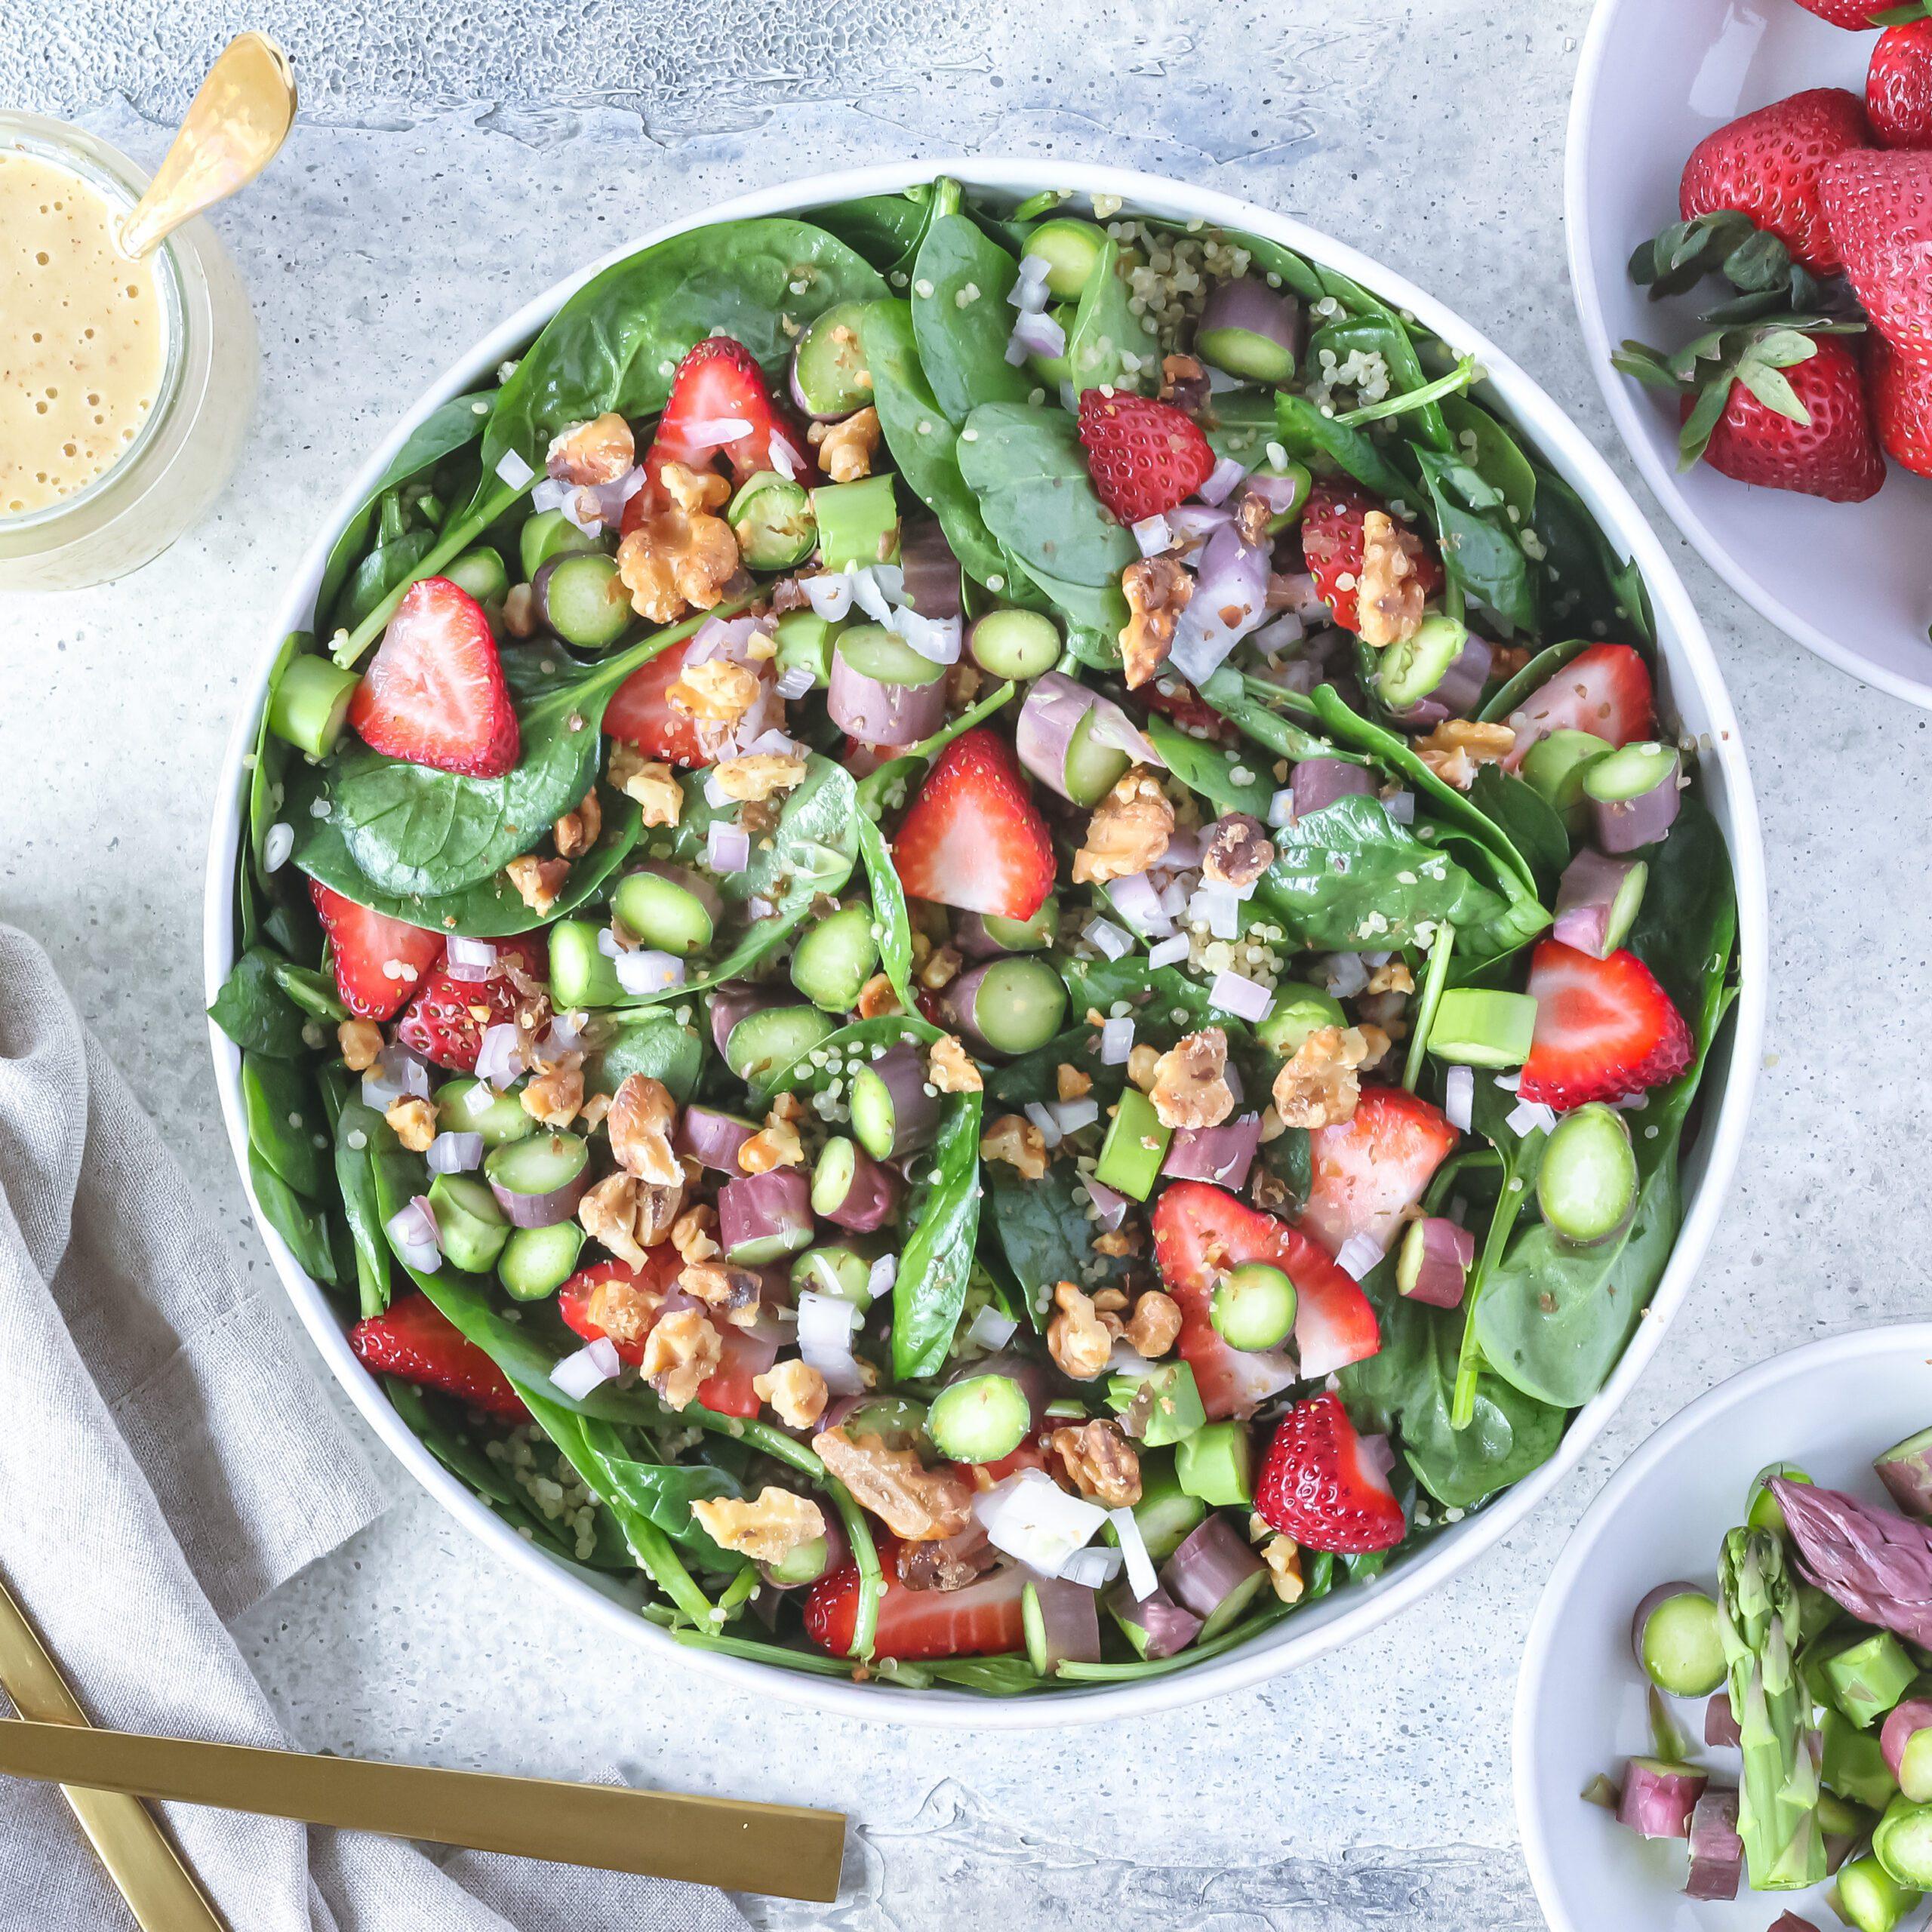 Strawberry & Asparagus Quinoa Salad with Maple Vinaigrette Dressing